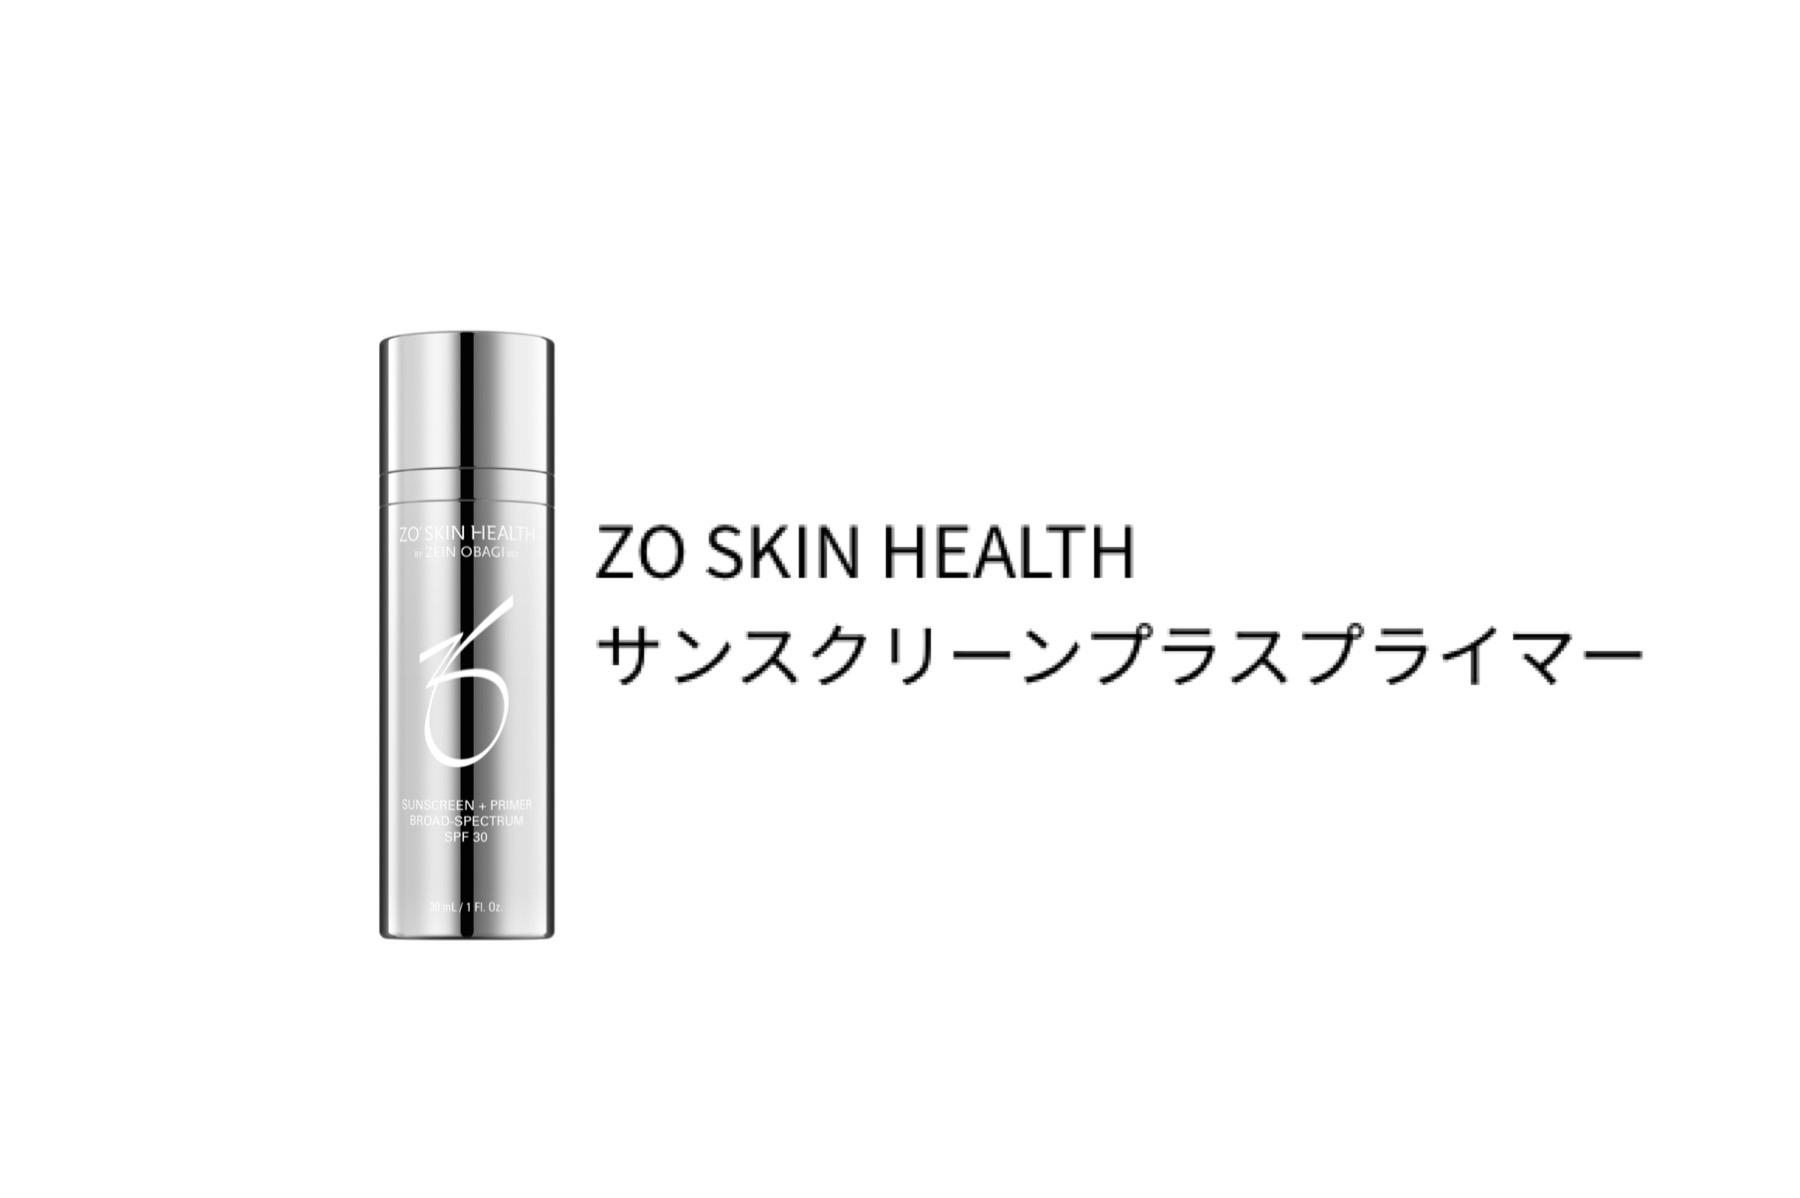 ZO SKIN HEALTH サンスクリーンプラスプライマー